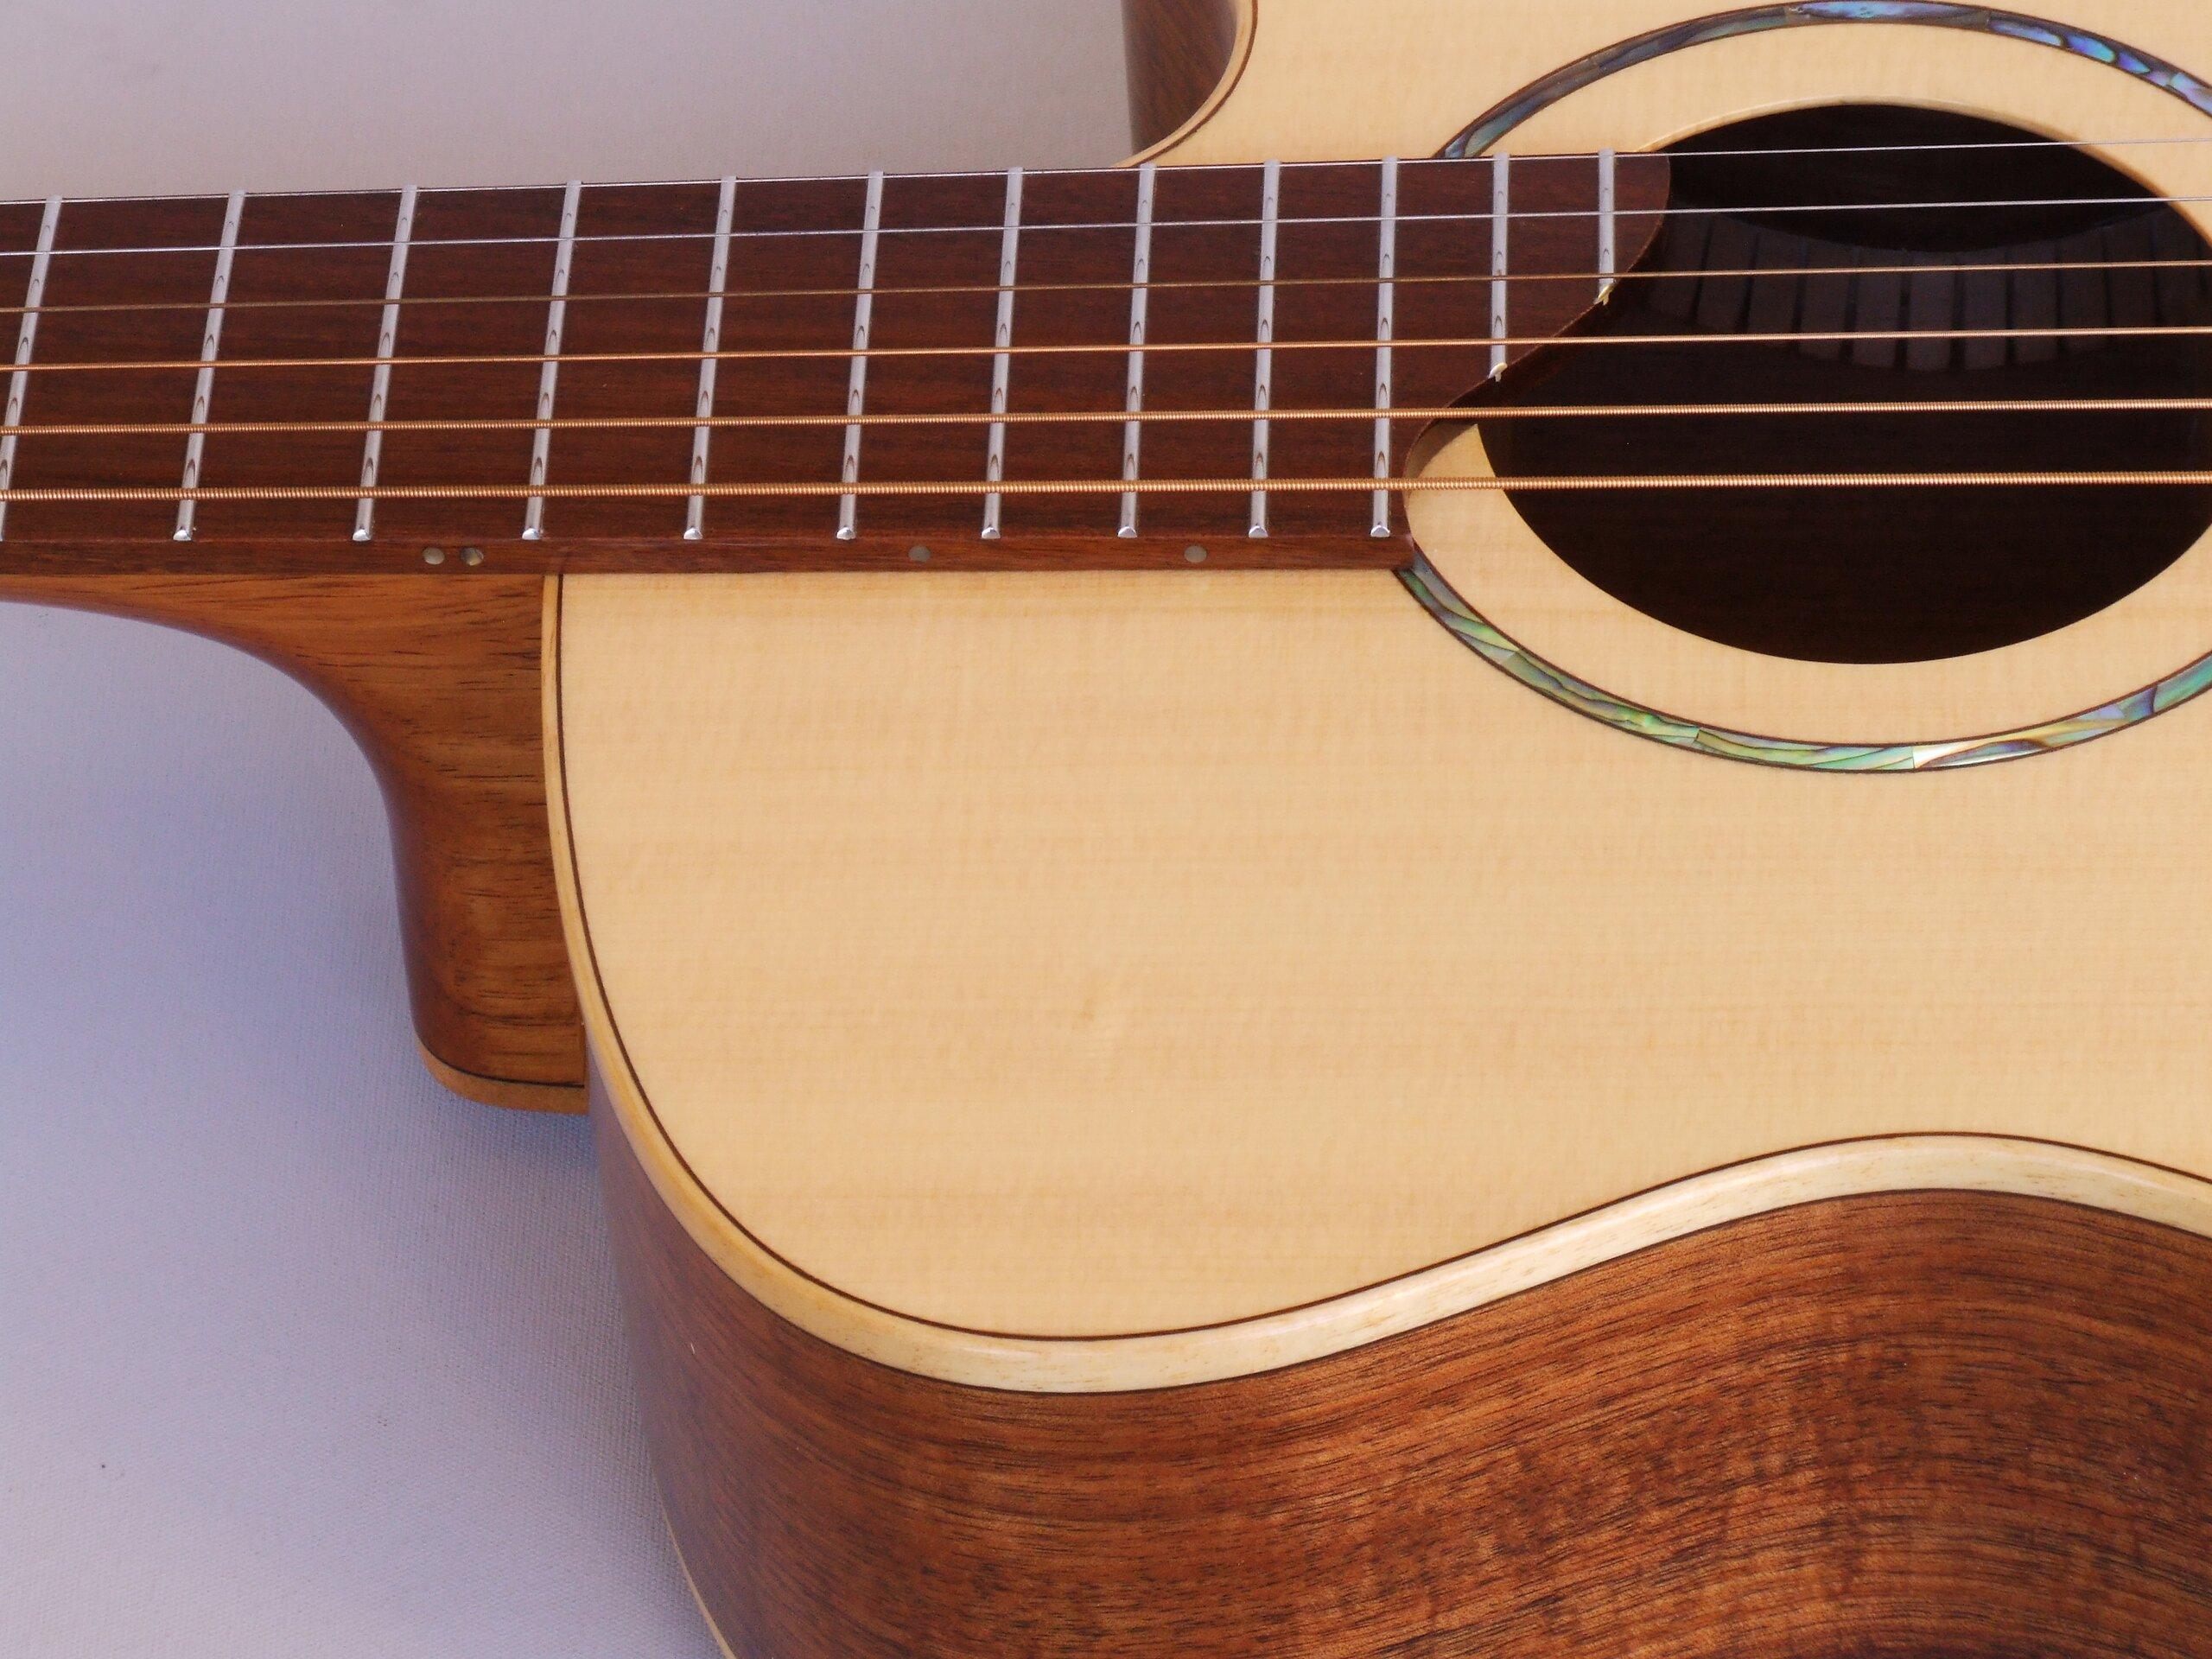 Fret board end on a small body steel string guitar